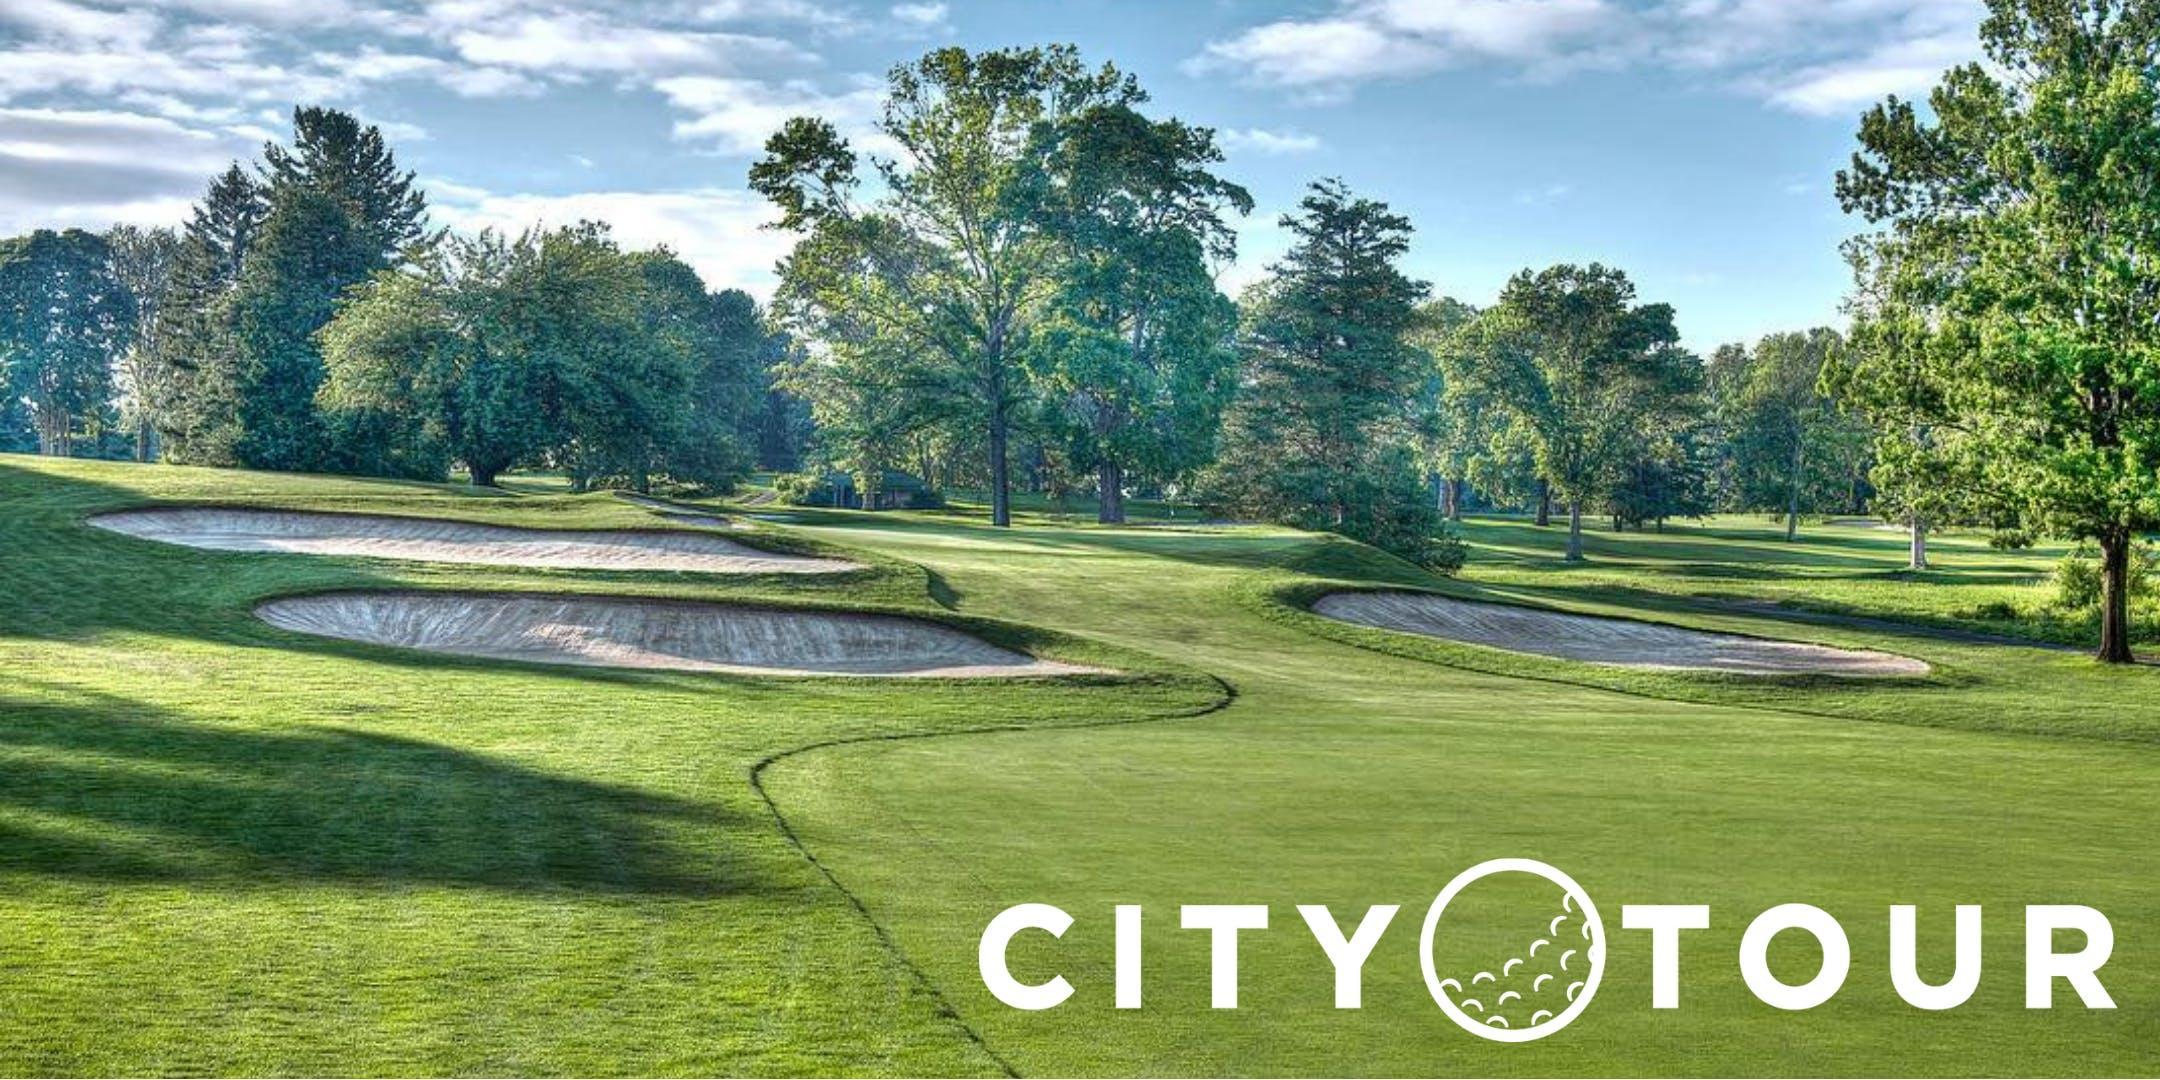 DC City Tour - Lake Presidential Golf Club